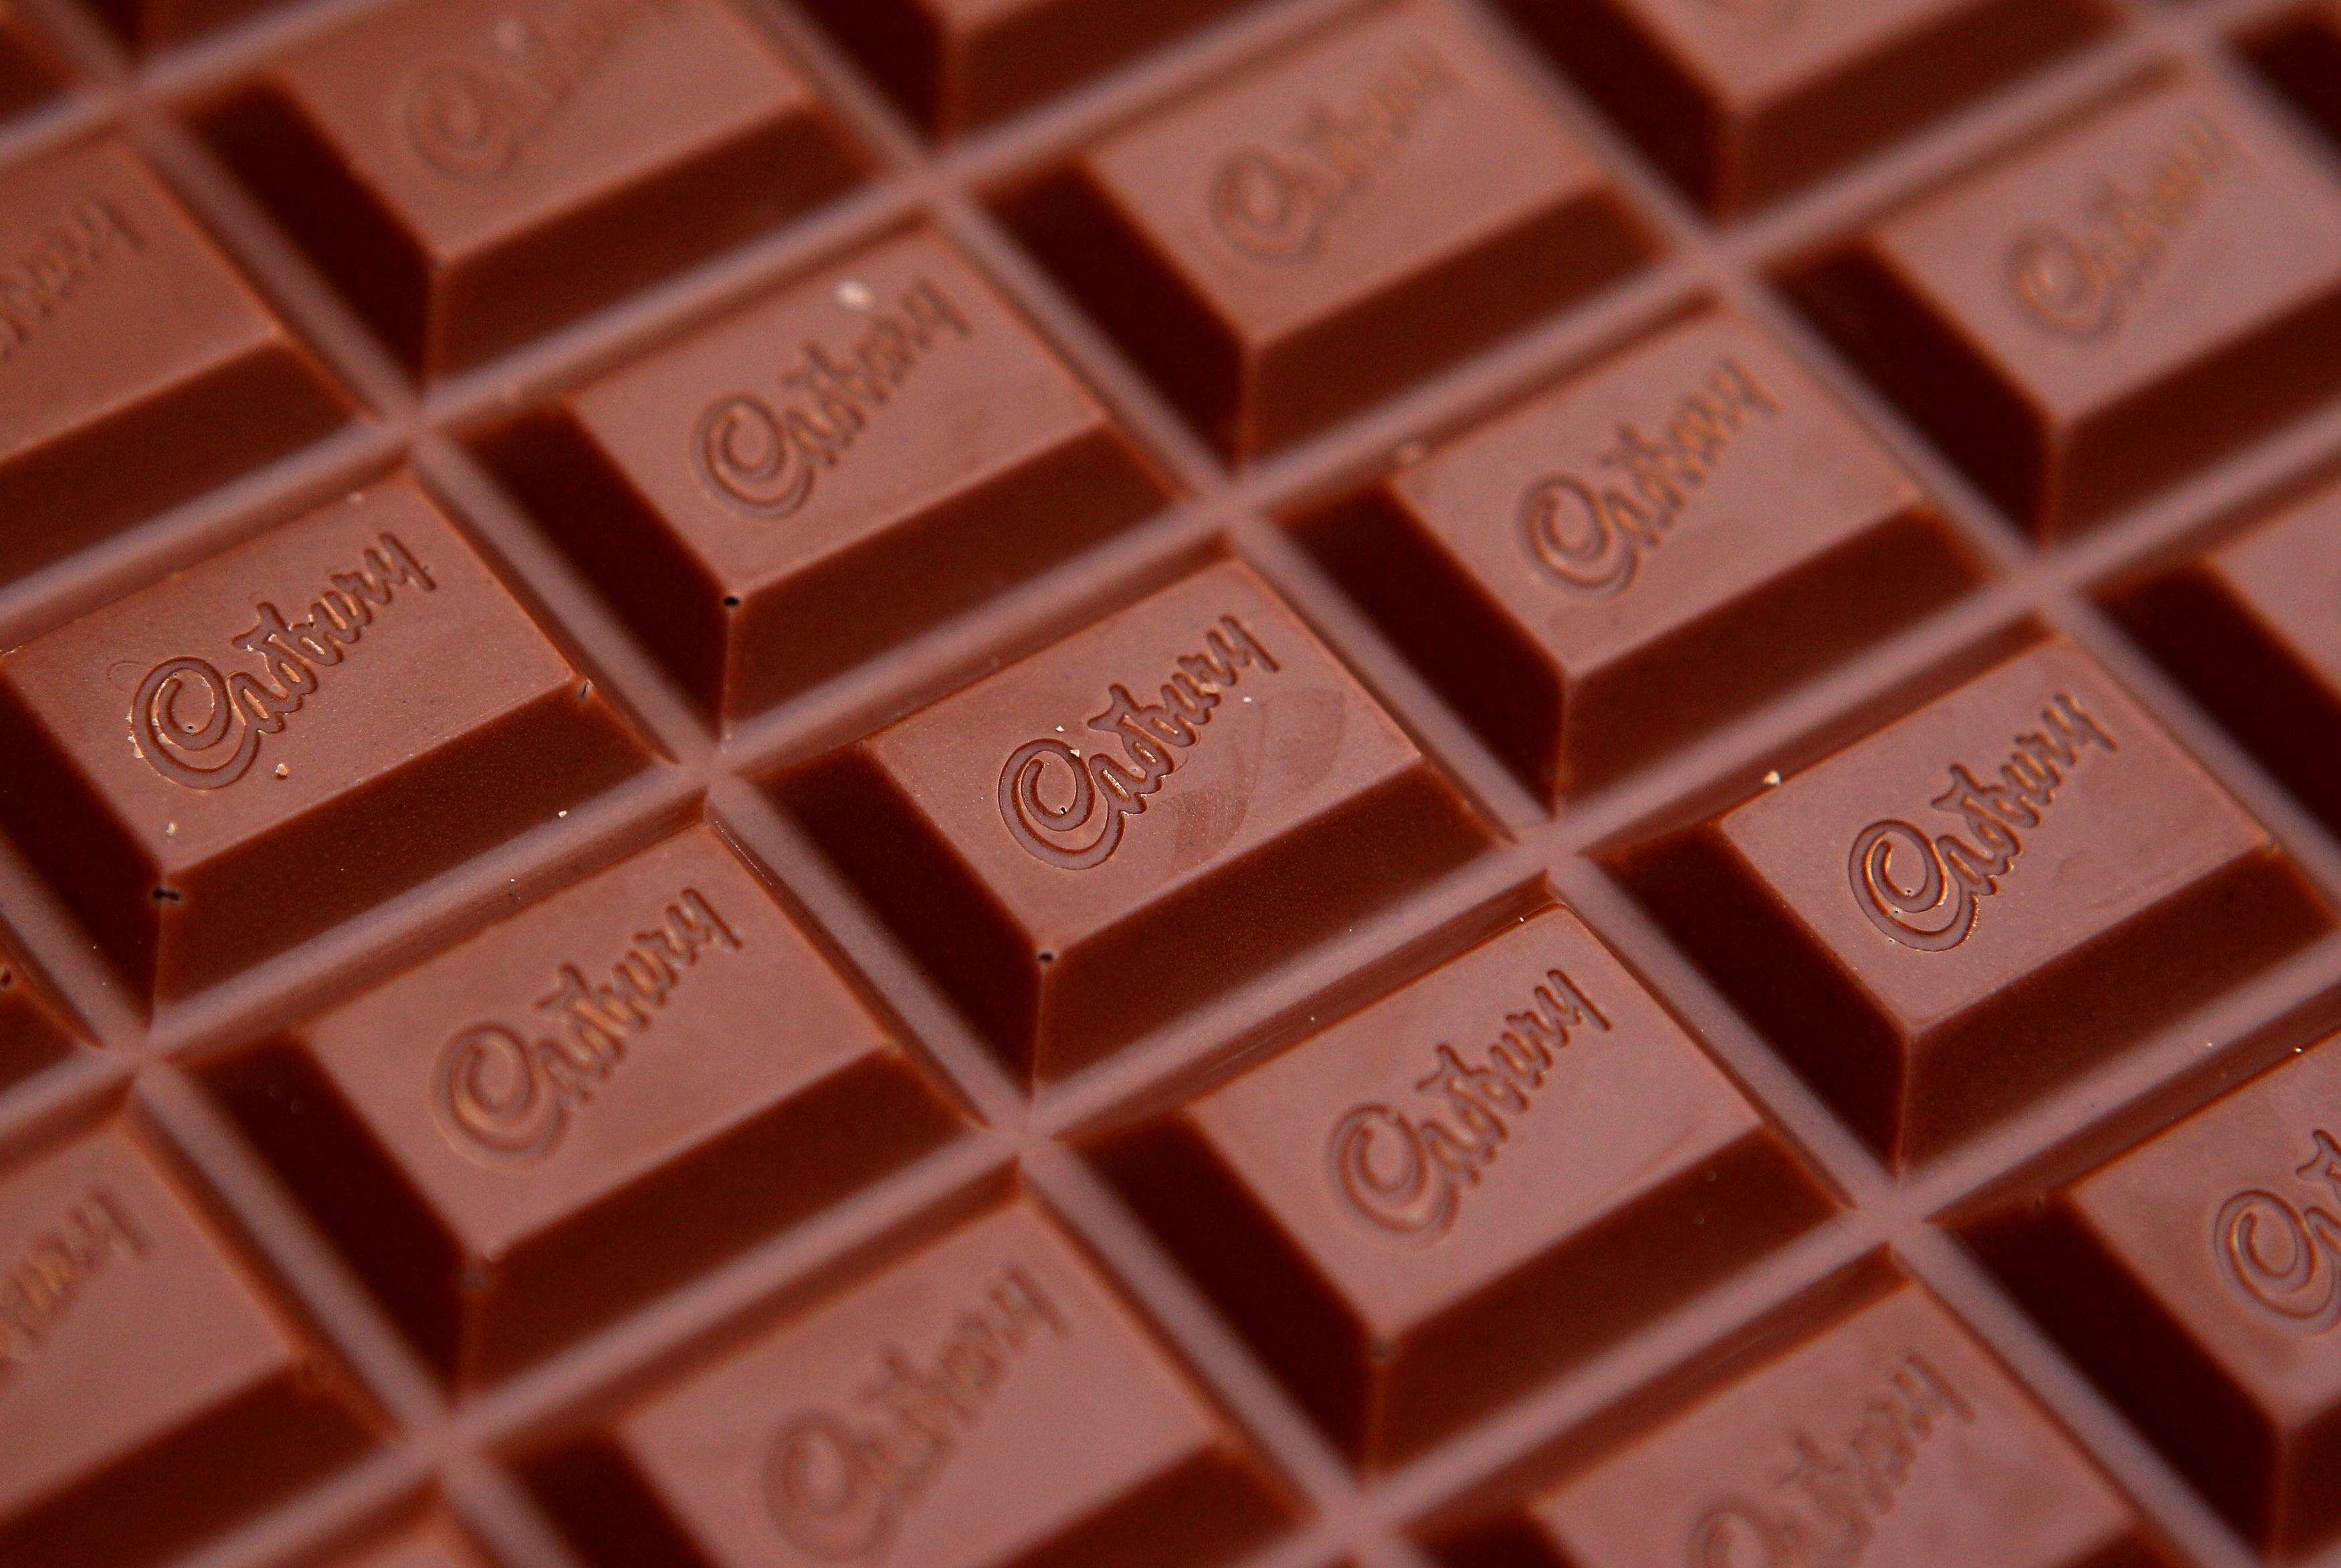 As rural India develops taste for chocolate, a dominant Mondelez...